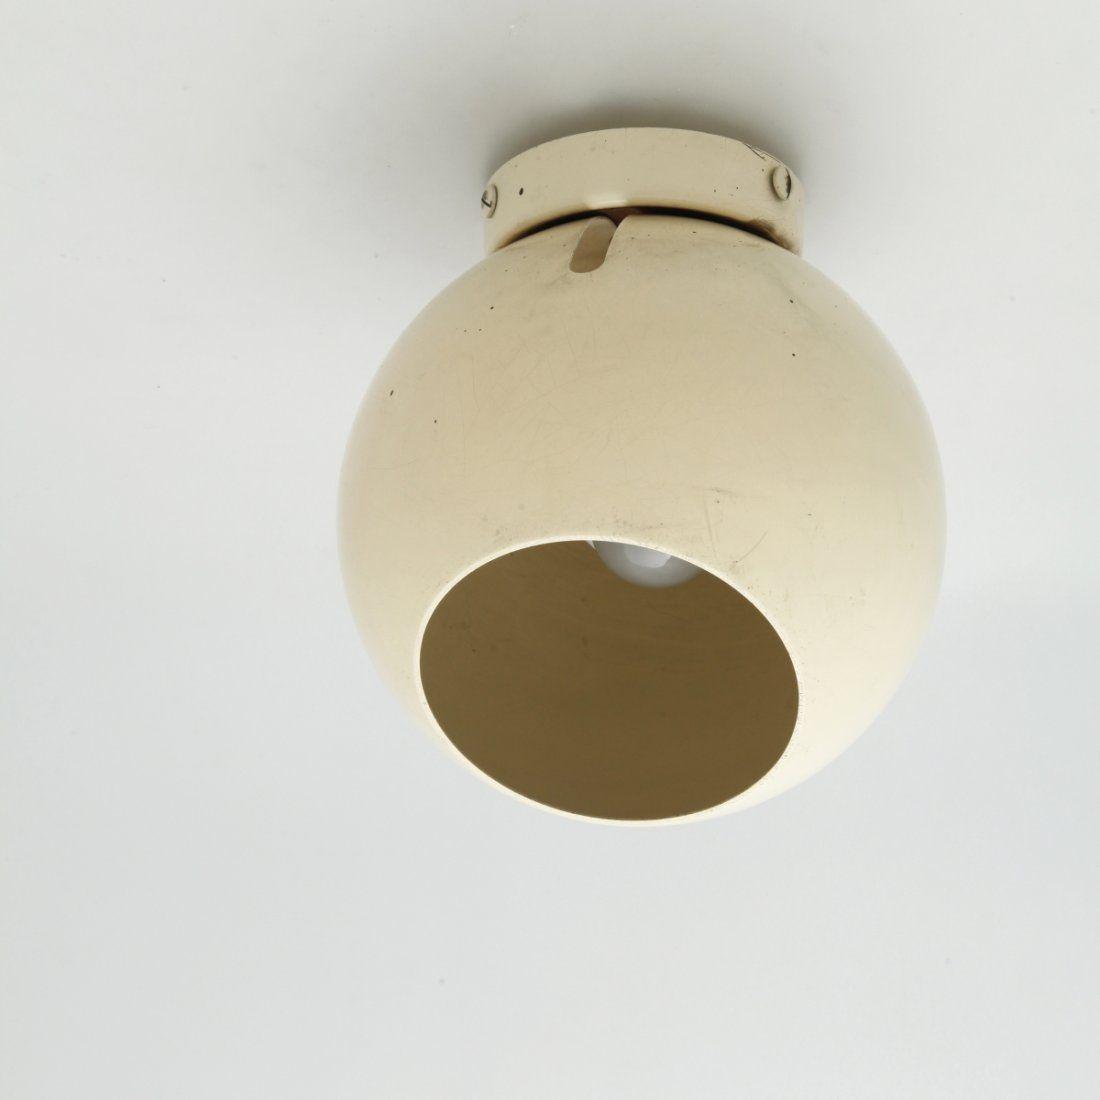 Gino Sarfatti; Enameled Aluminum Adjustable Ceiling light for Arteluce, 1972.